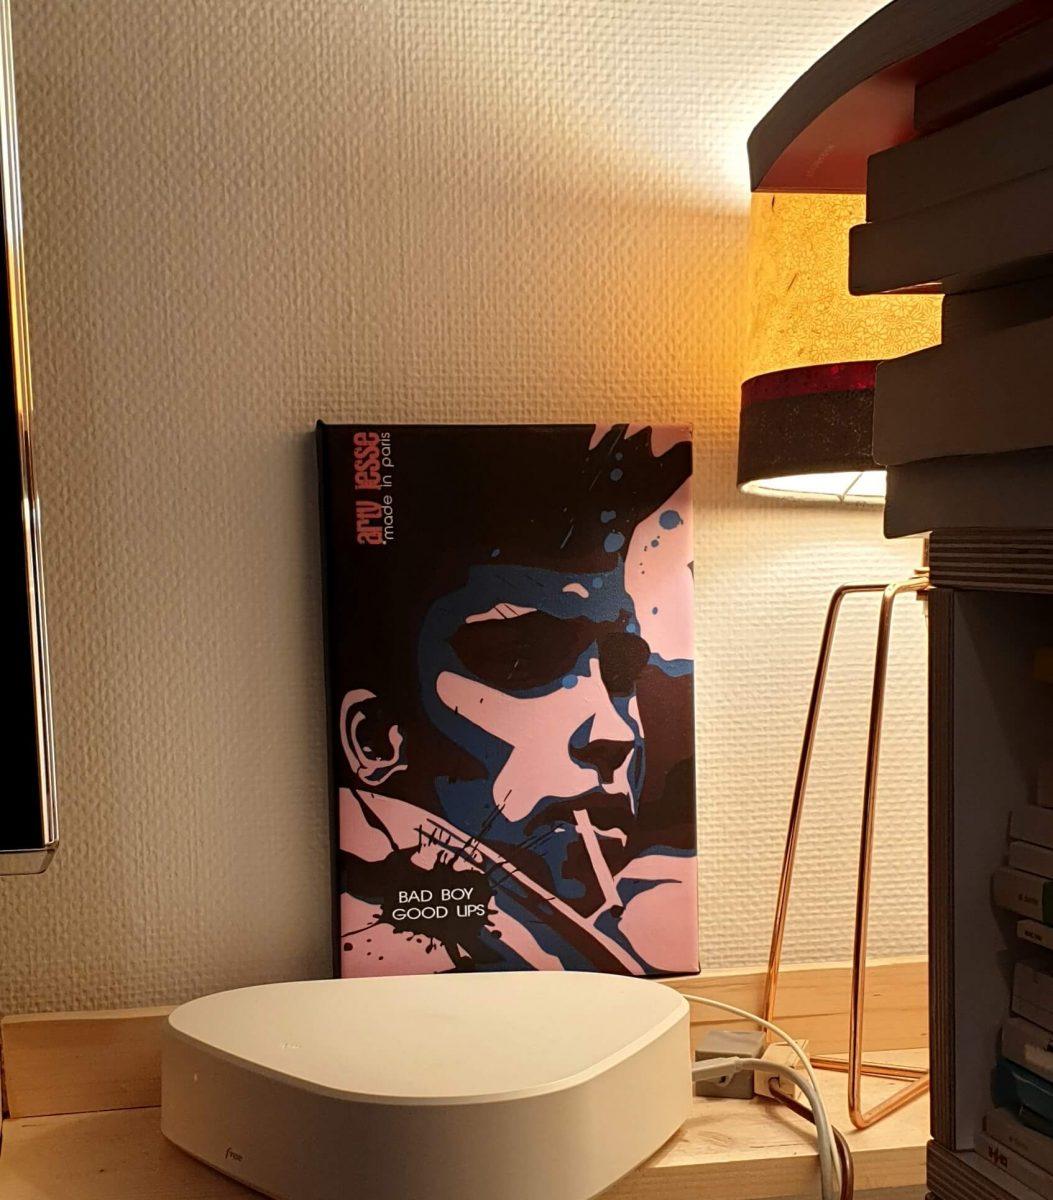 artiste peintre paris, reproduction, xmas gift, home decor